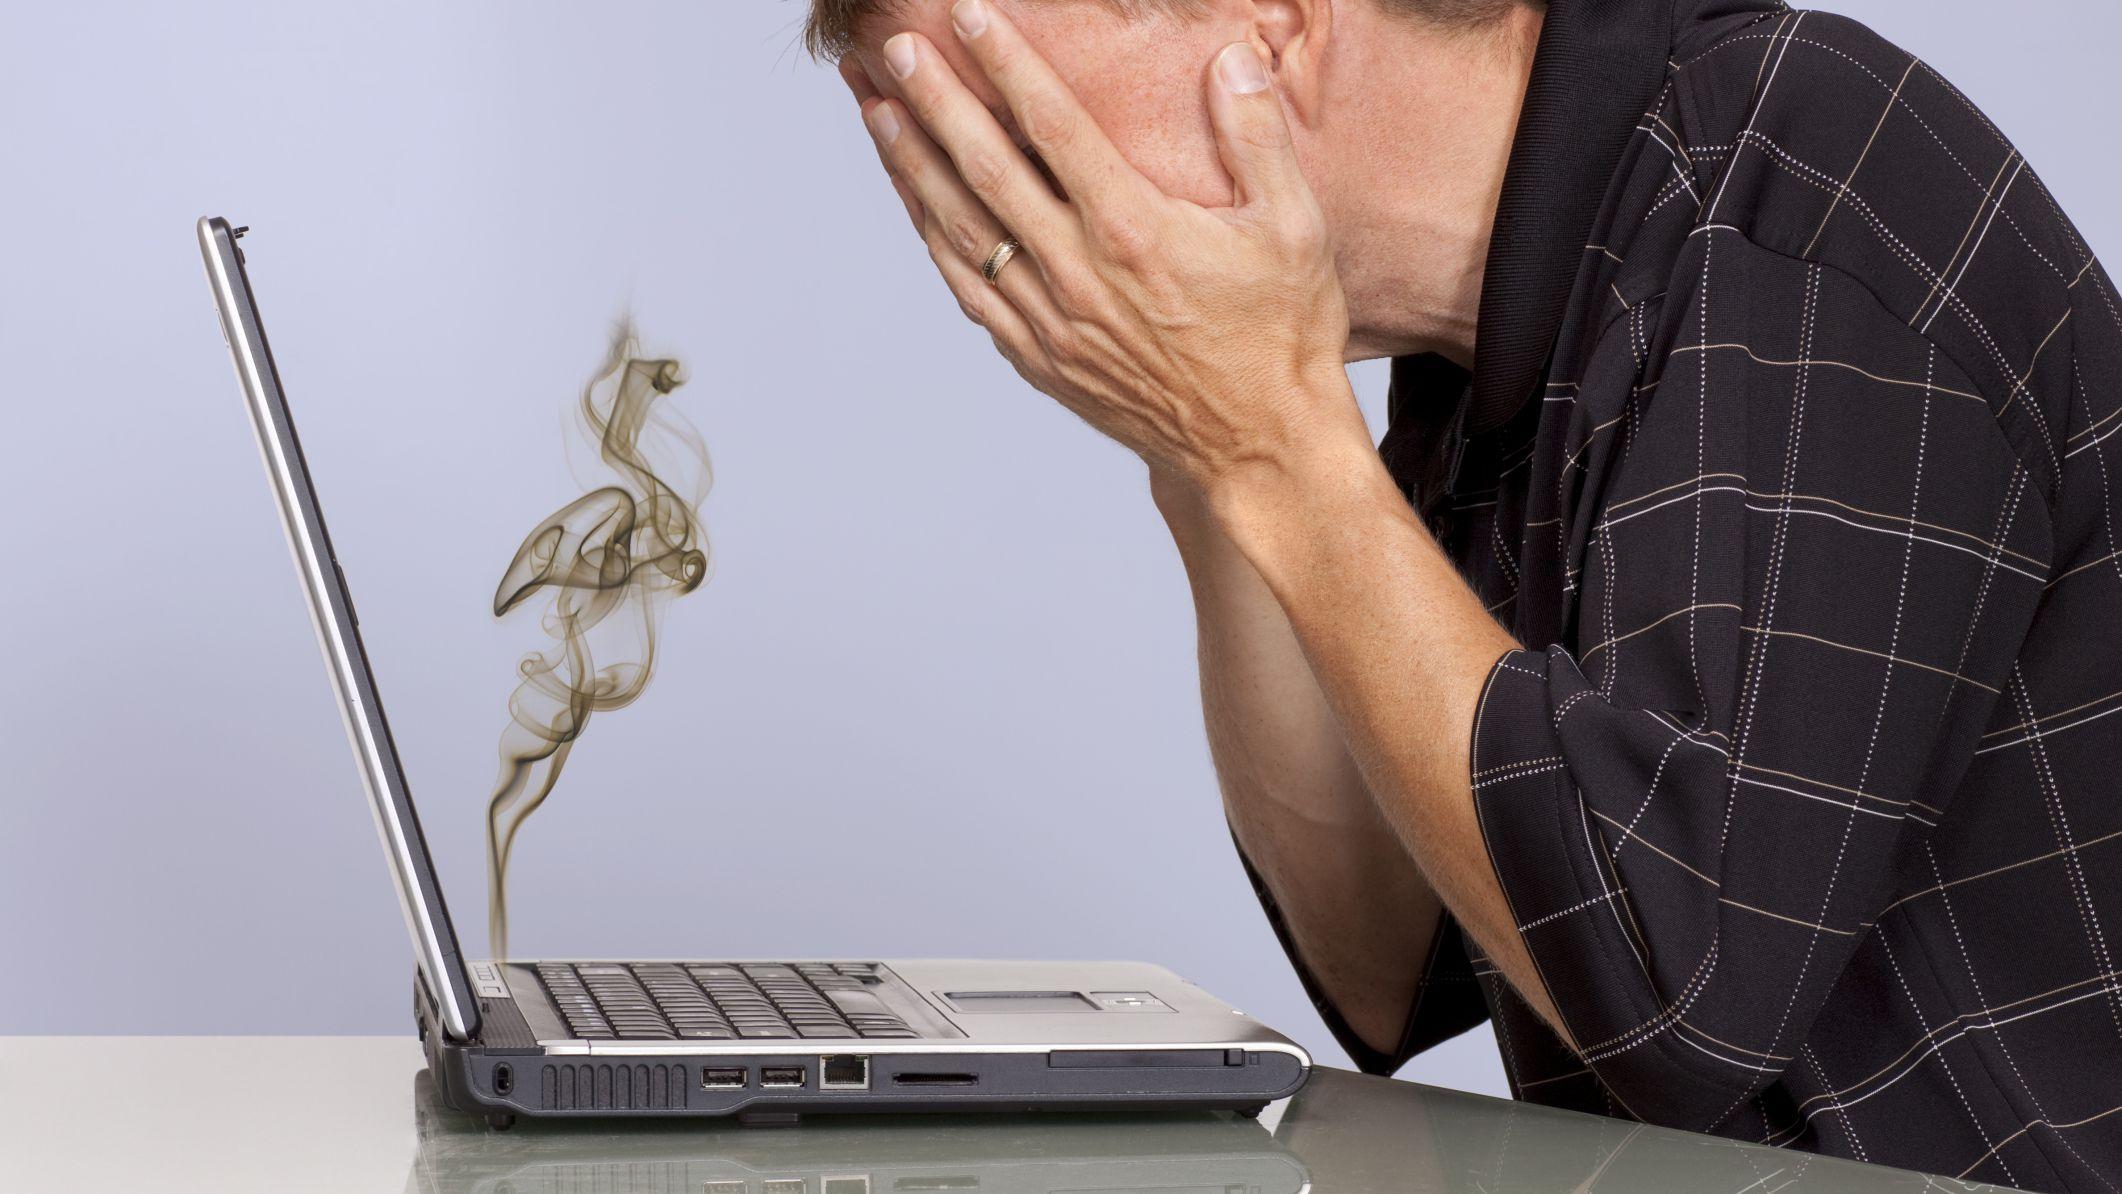 Getty-John-Cowie-Man-with-crashed-smoking-laptop-186845374-56a2f15f5f9b58b7d0cfd532.jpg